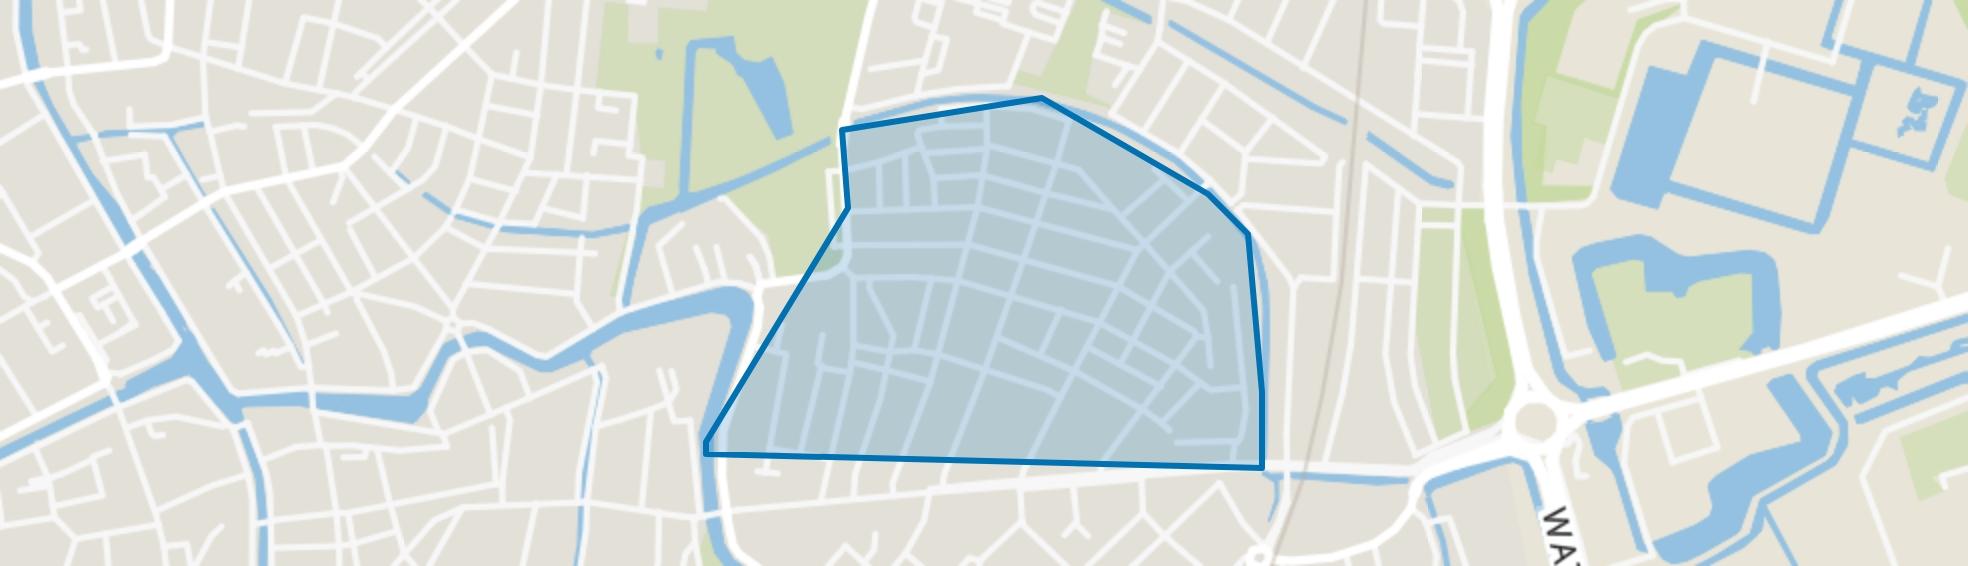 Wittevrouwen, Utrecht map